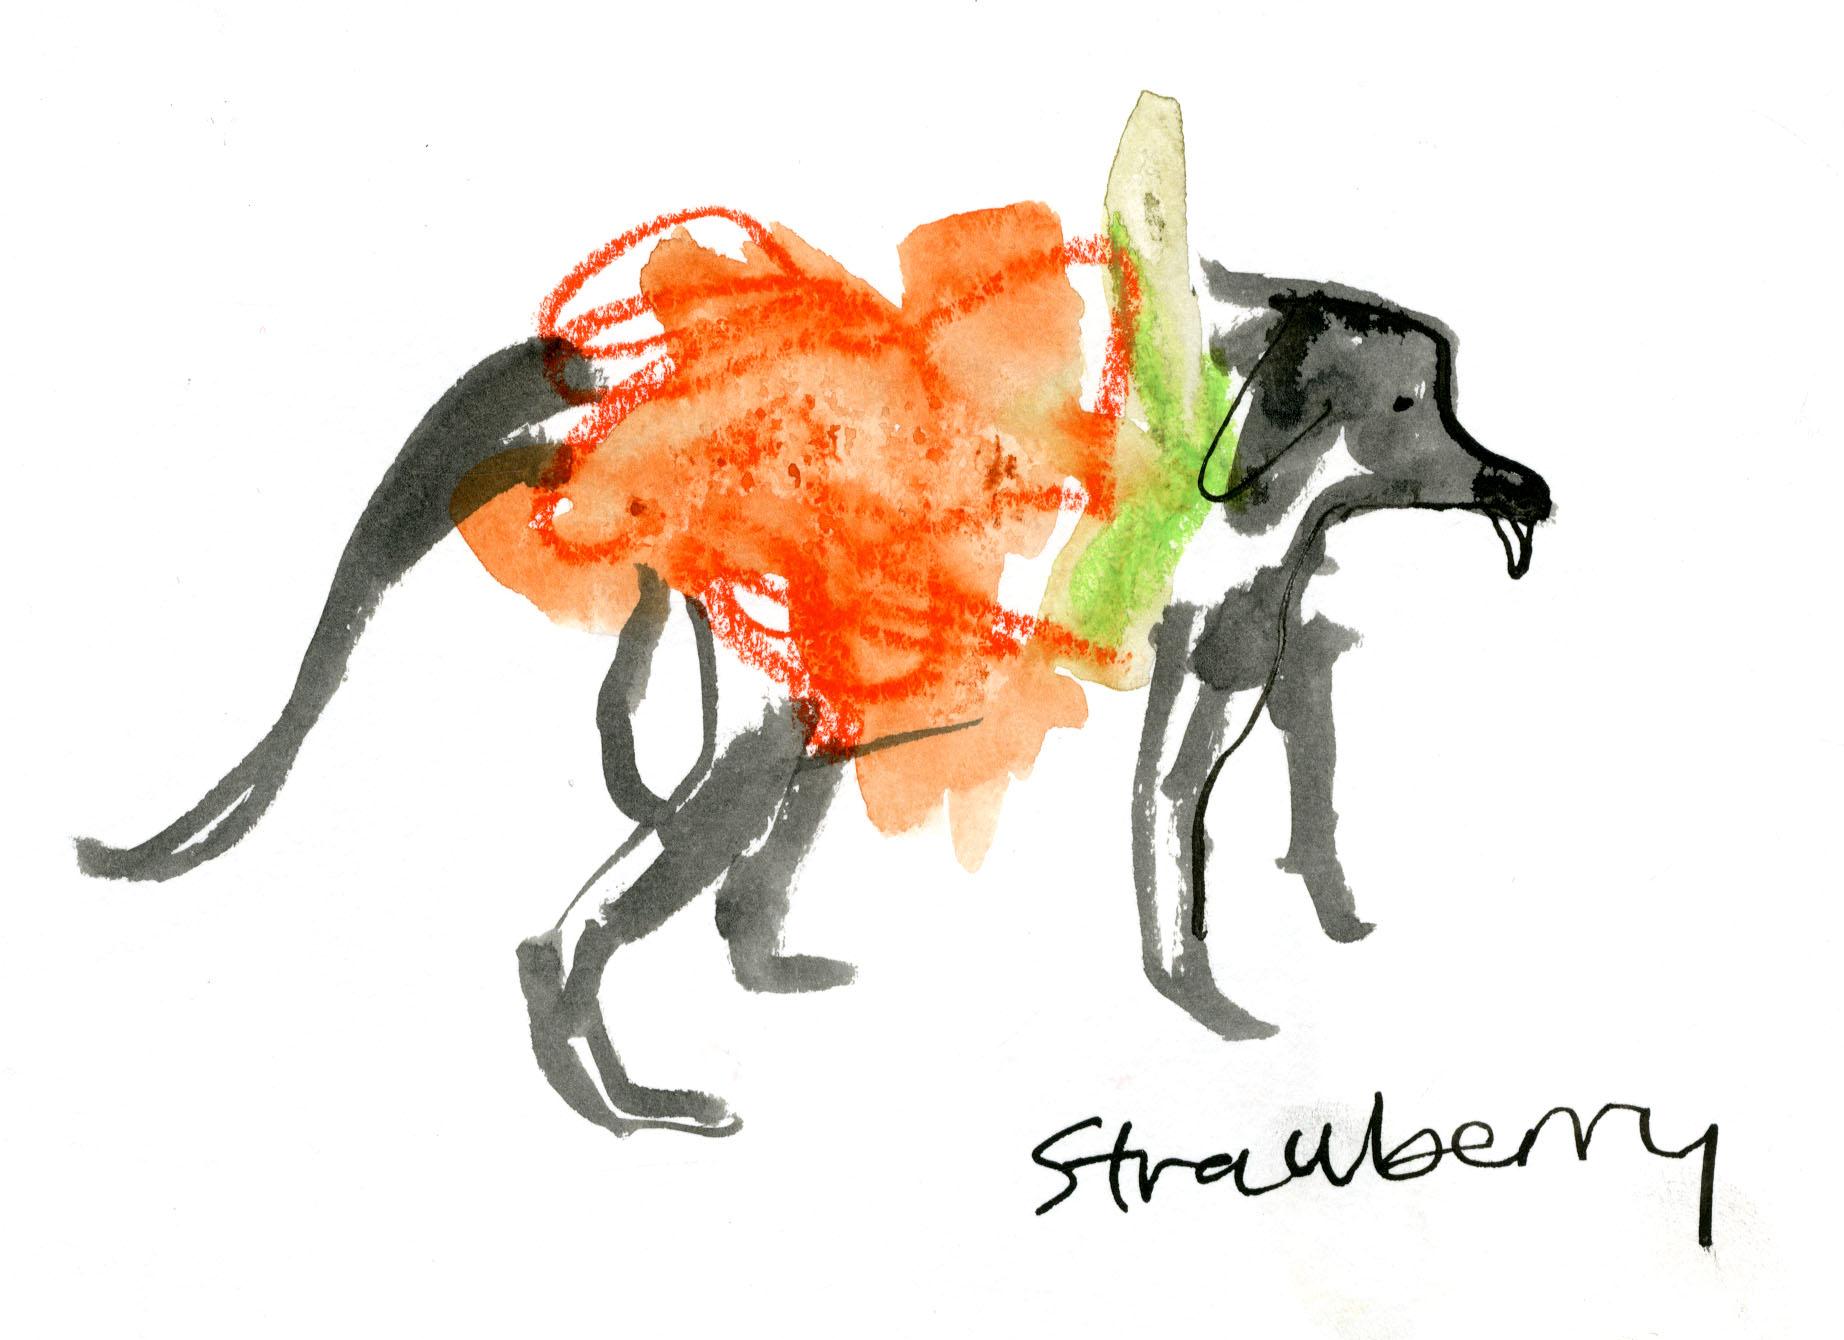 Fluffy strawberry dog © Carly Larsson 2014